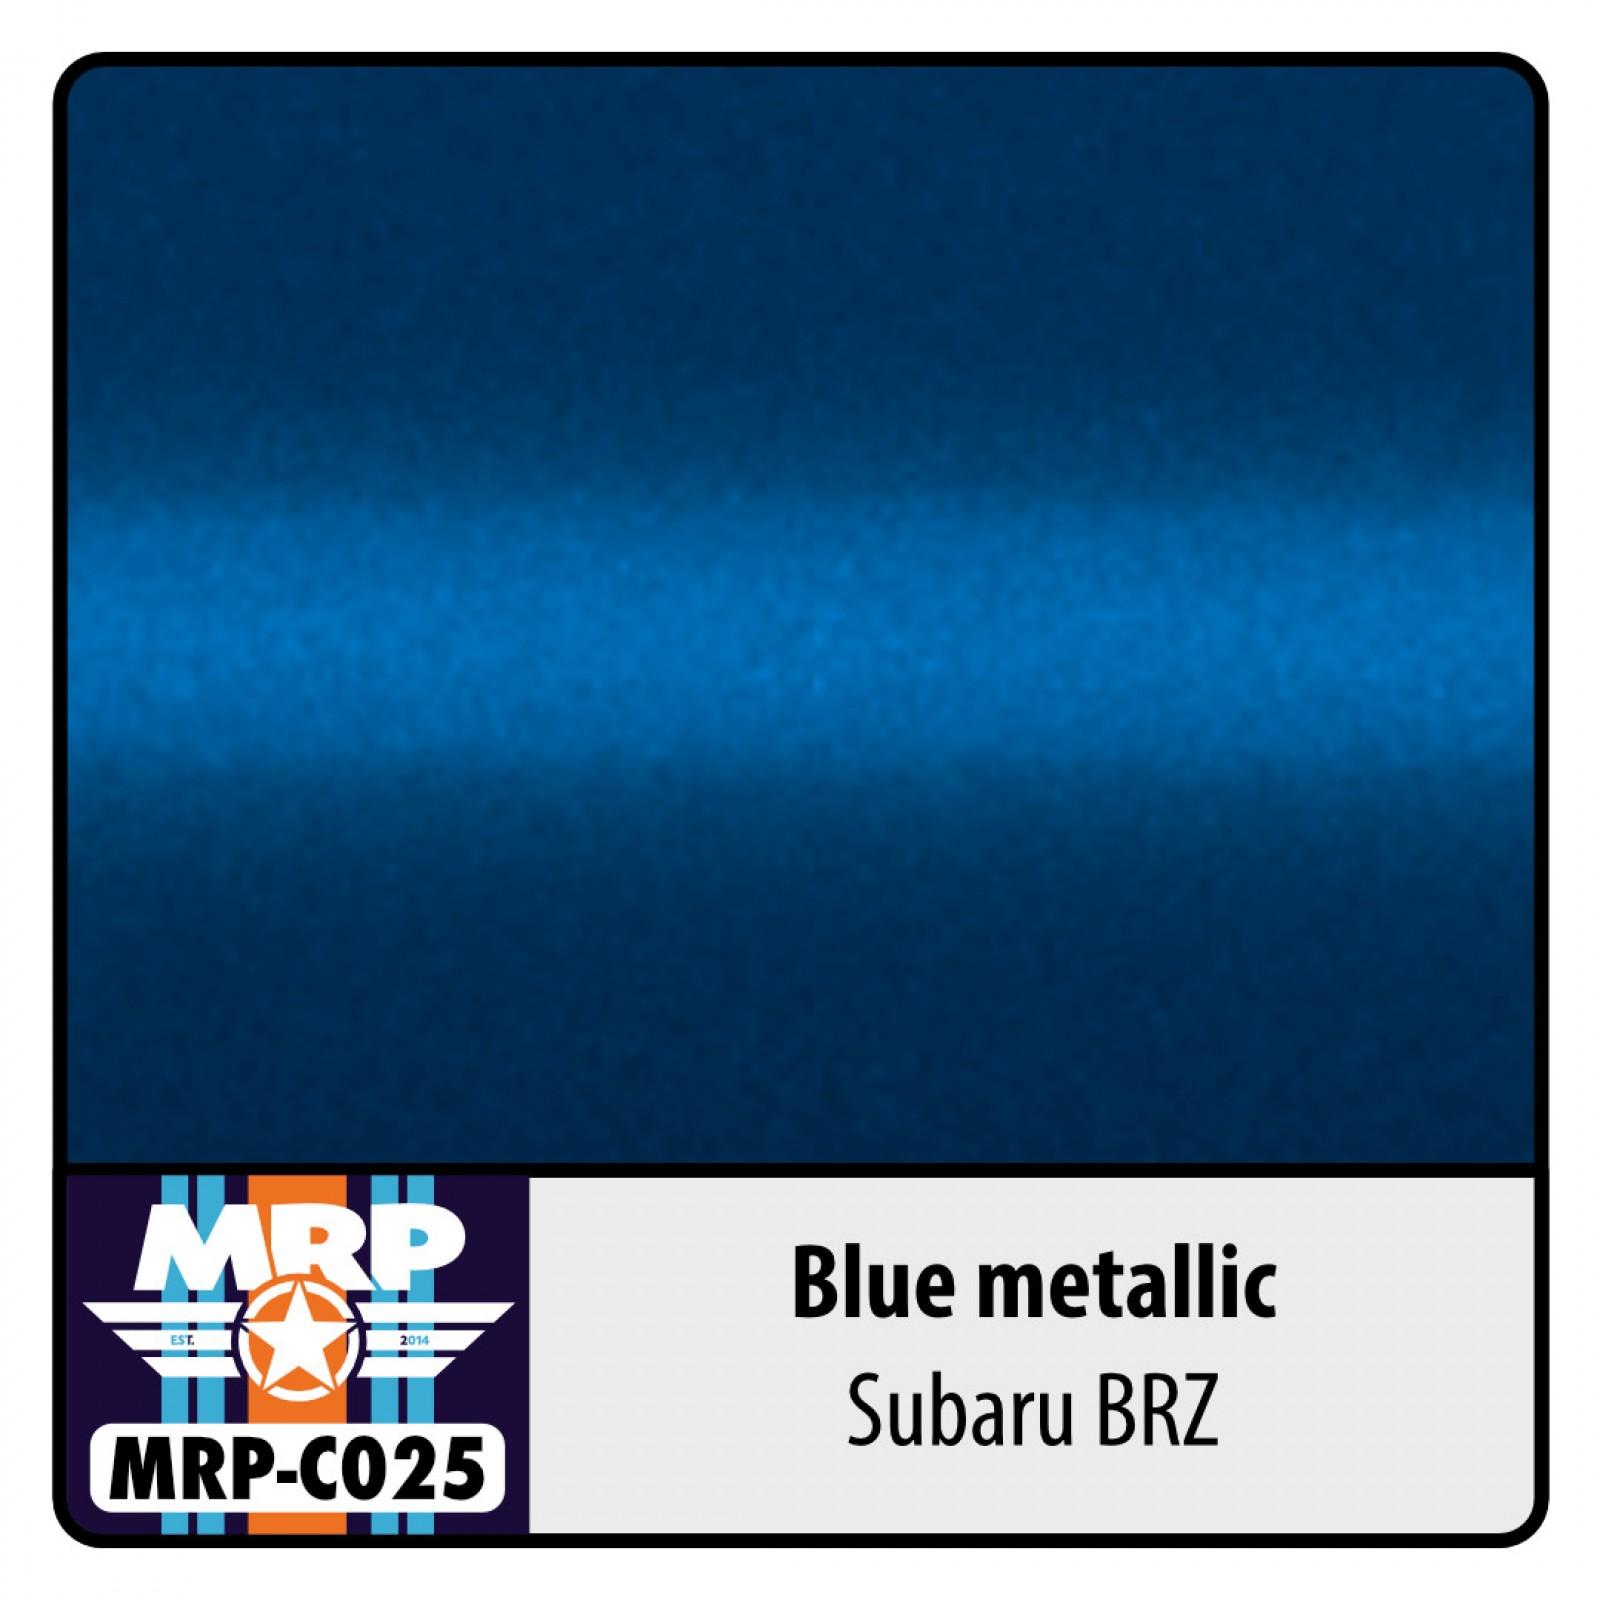 MRP-C025  Blue metallic for Subaru BRZ